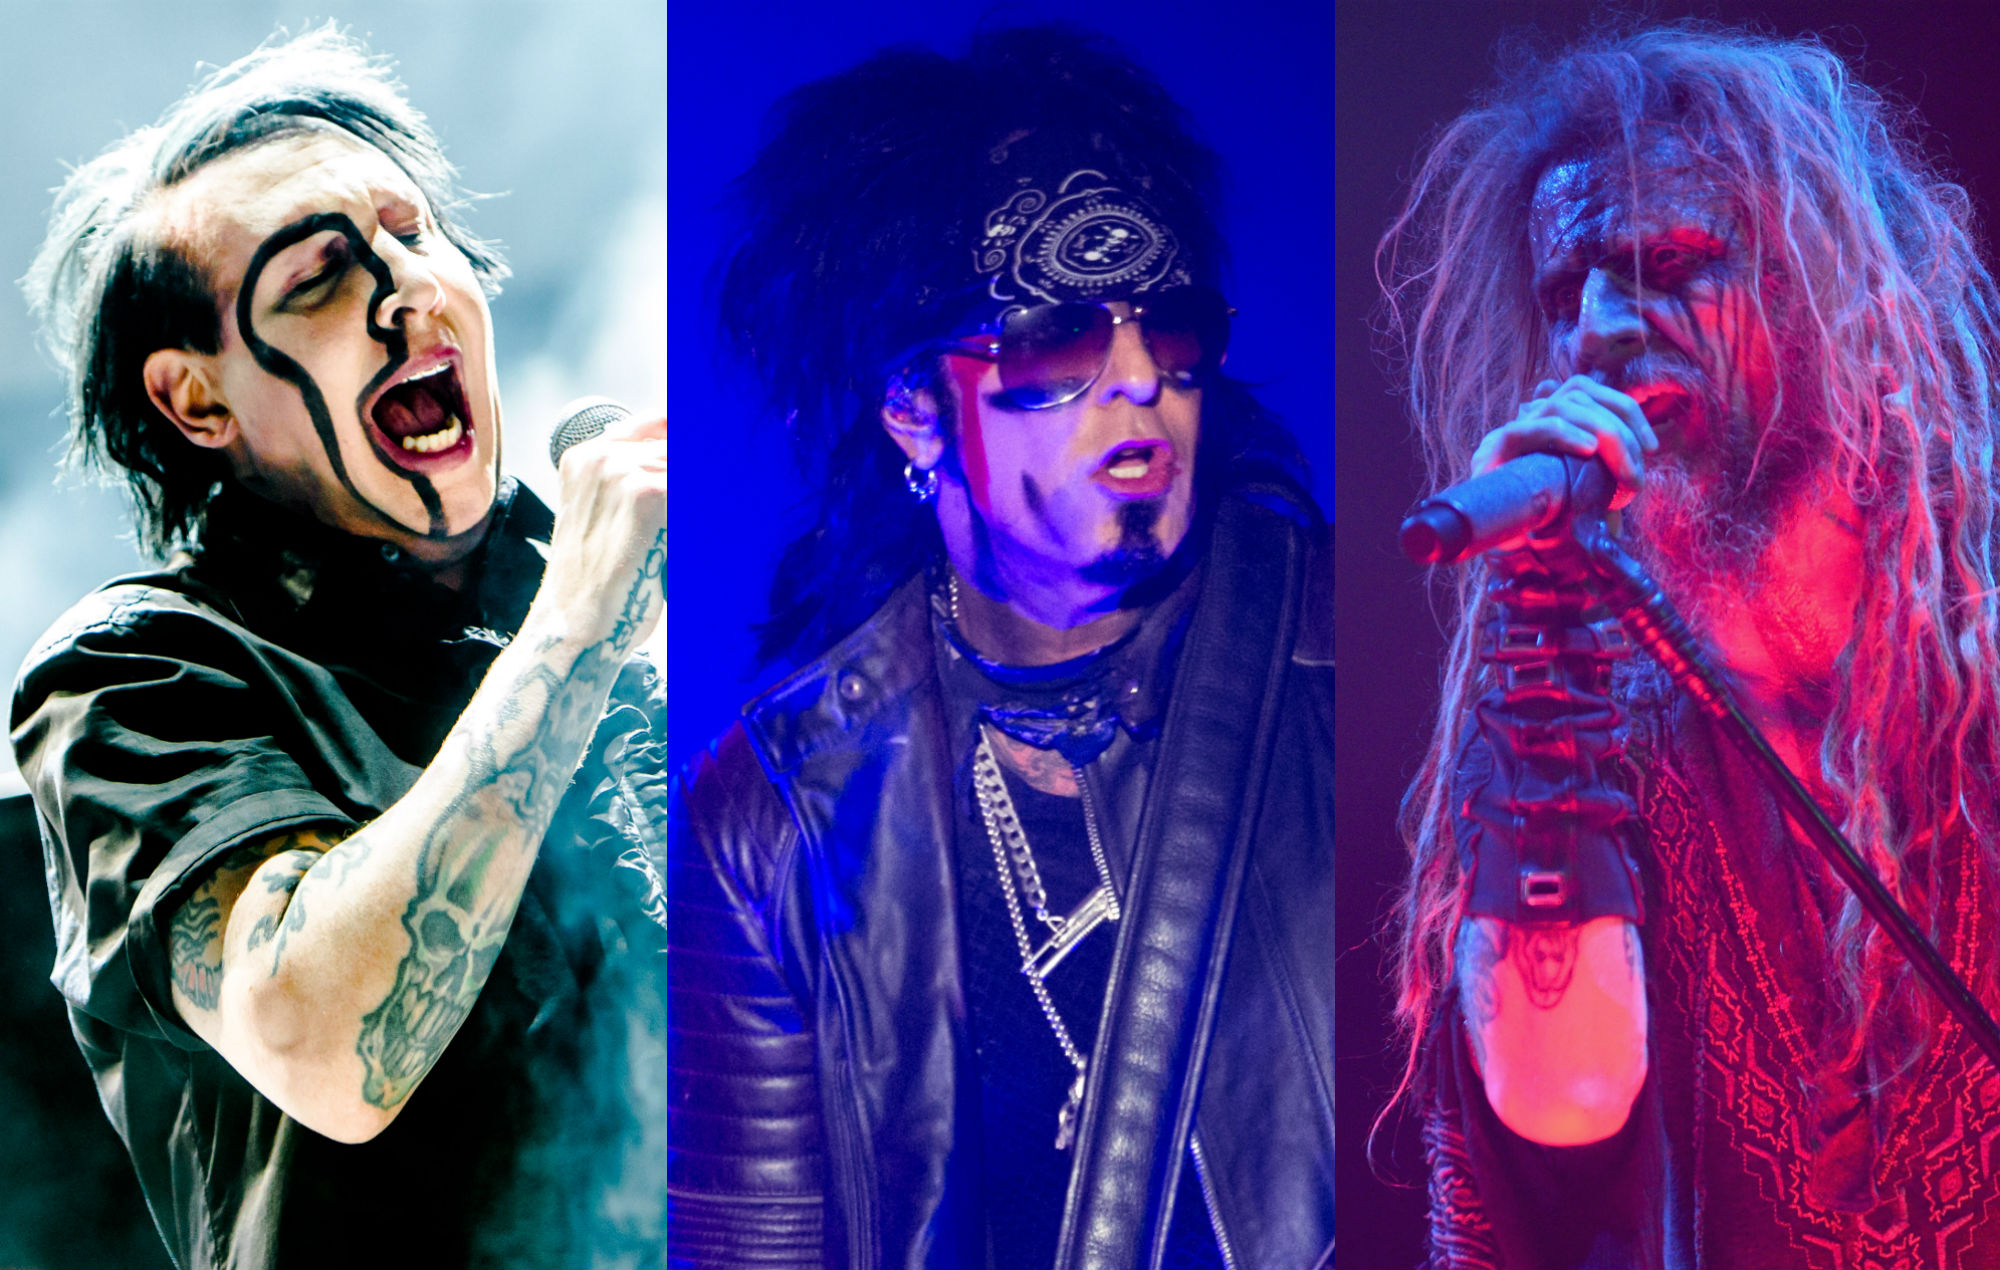 Marilyn Manson nikki sixx rob zombie cover beatles